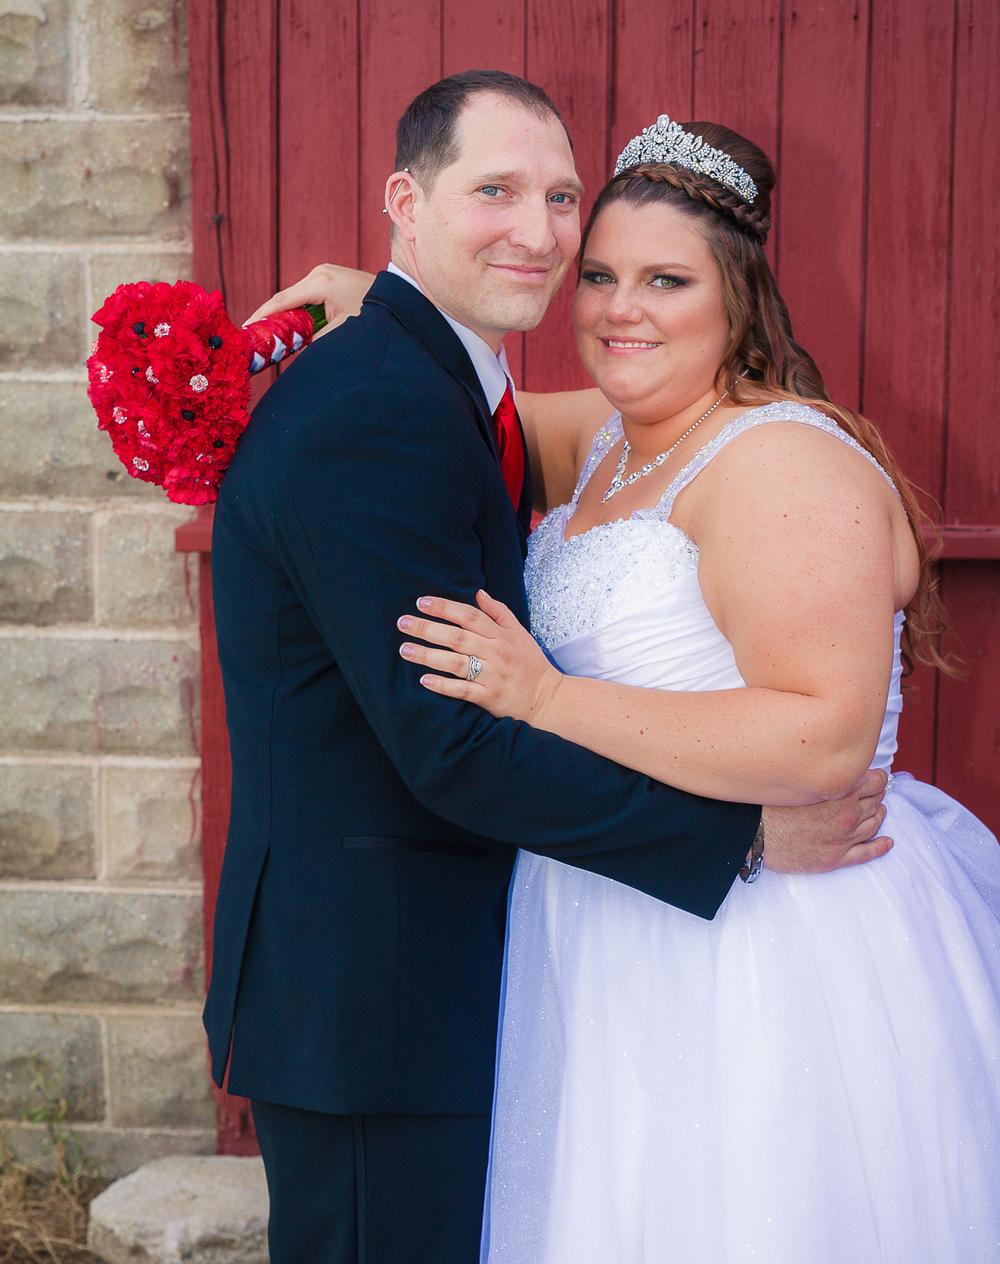 jenna + tony wedding blog (58 of 112).jpg